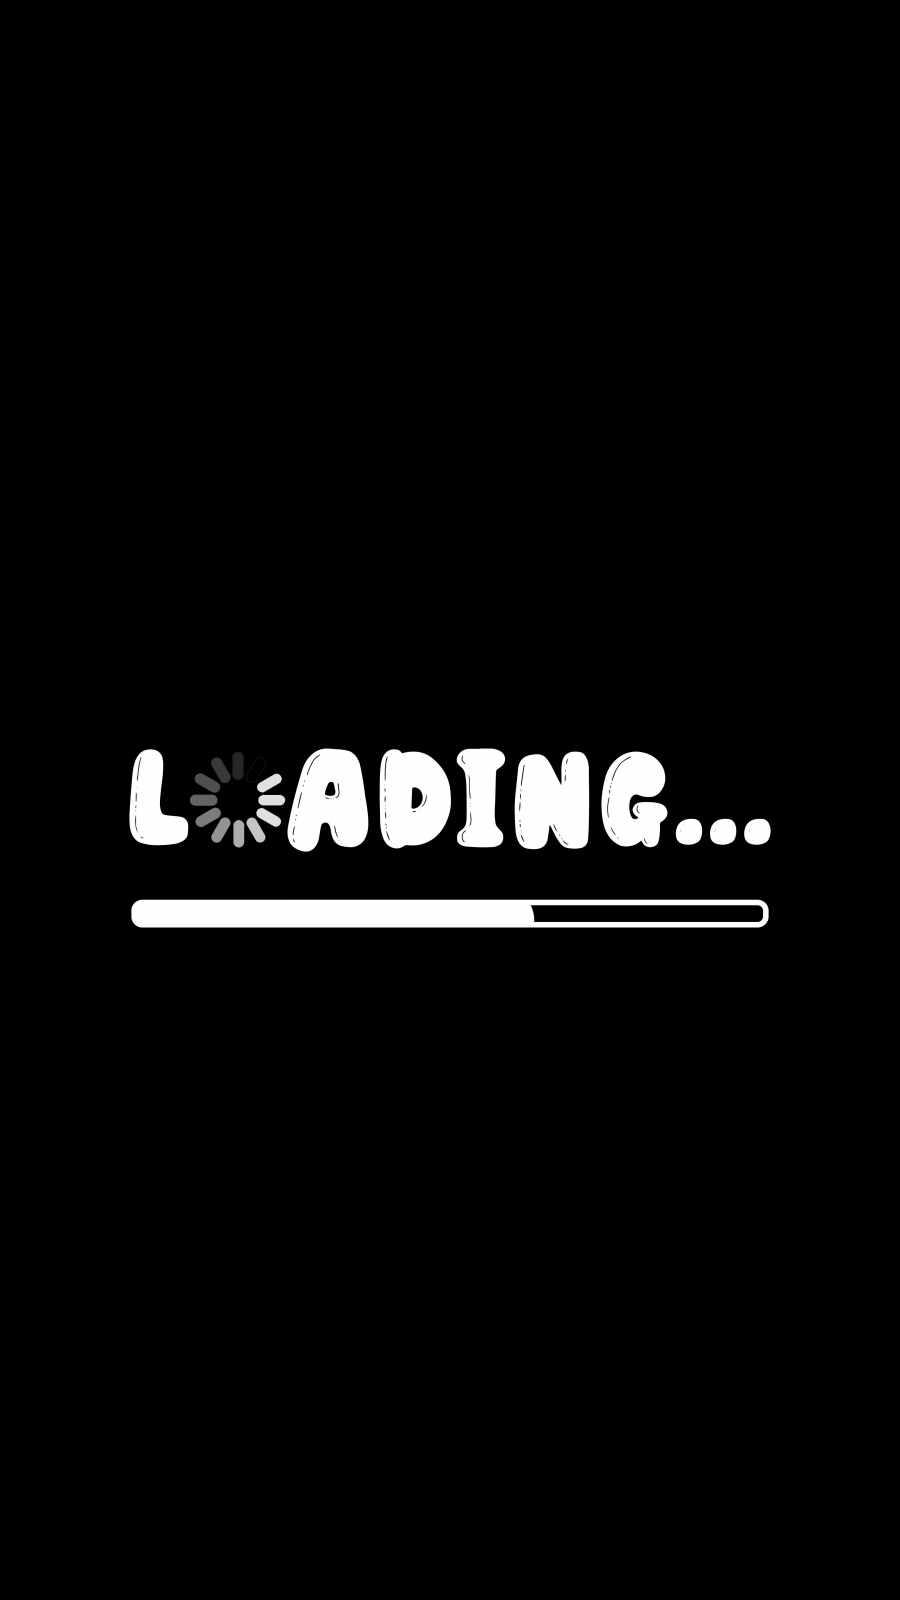 Loading iPhone Wallpaper